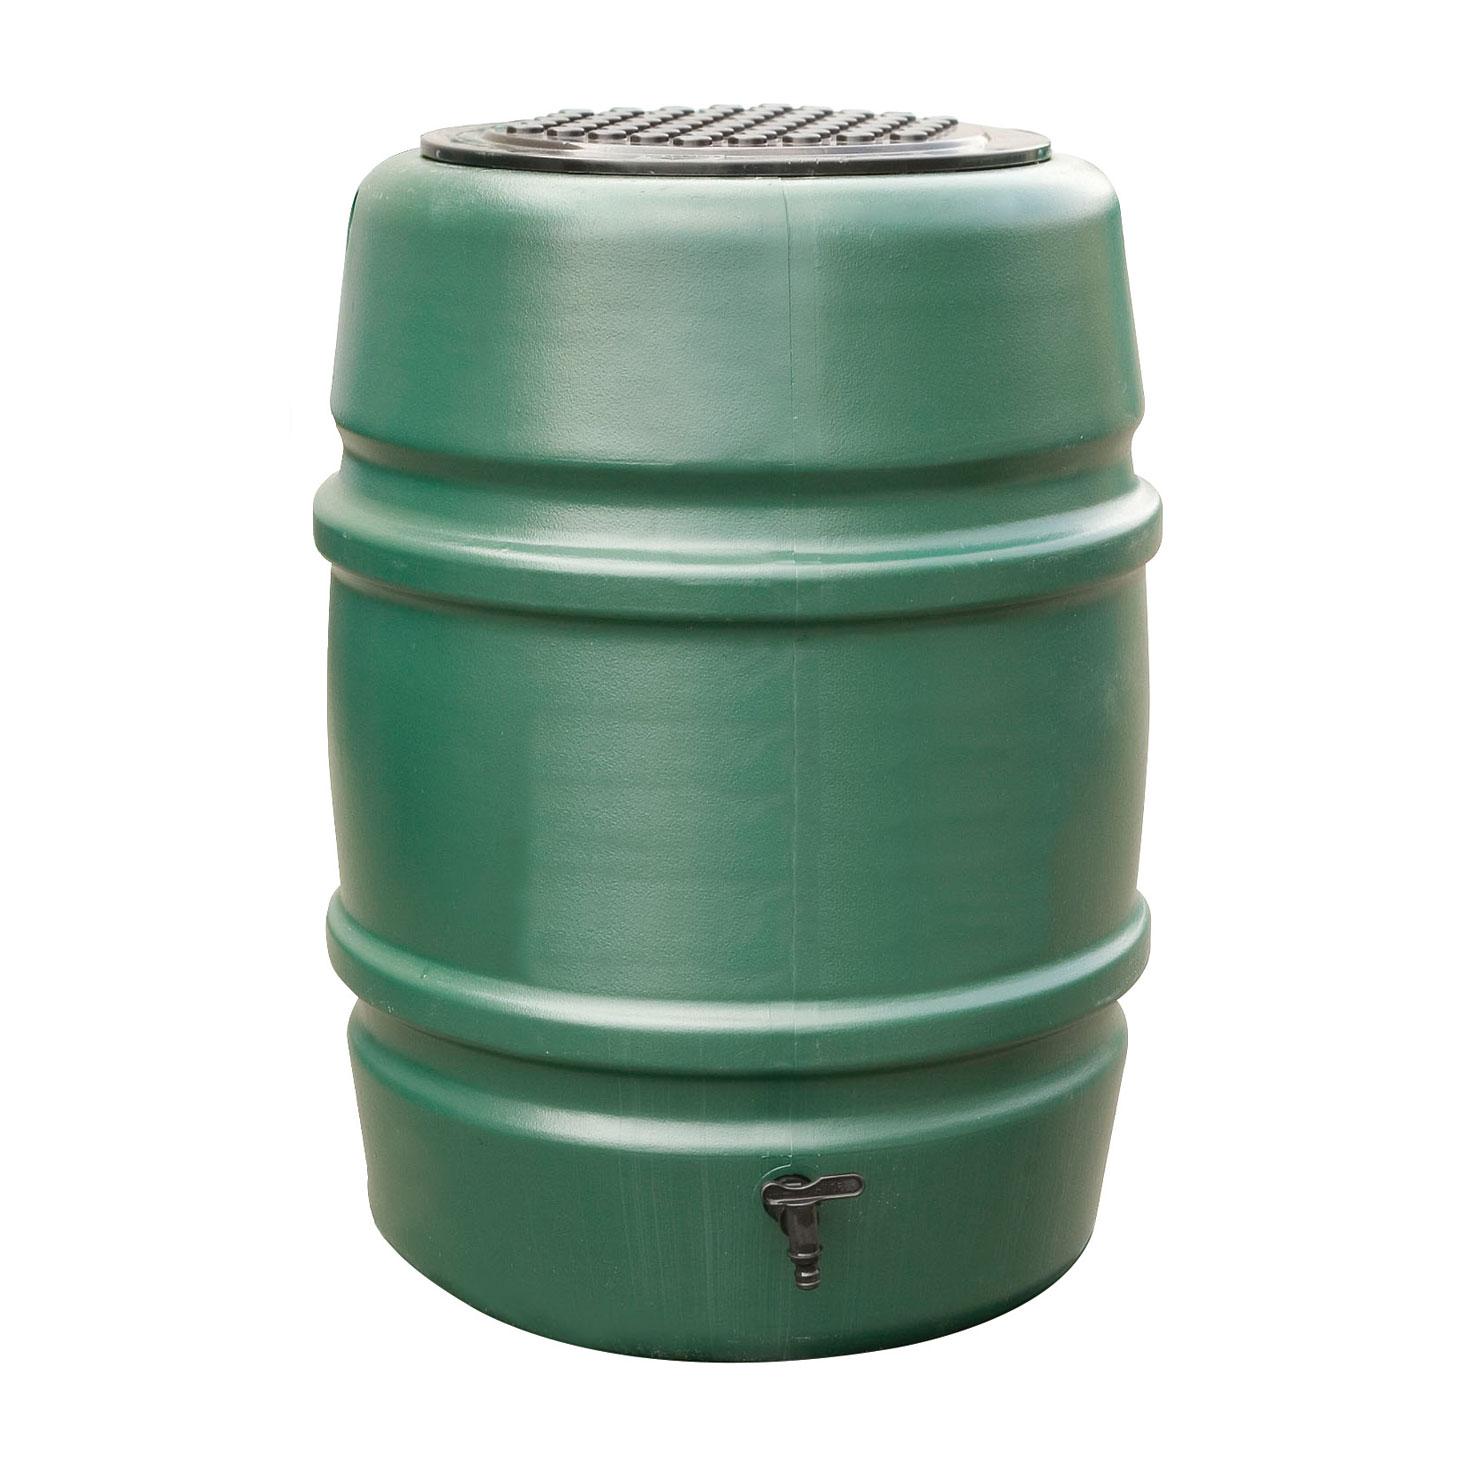 Regenton 227 liter: knalprijs €35